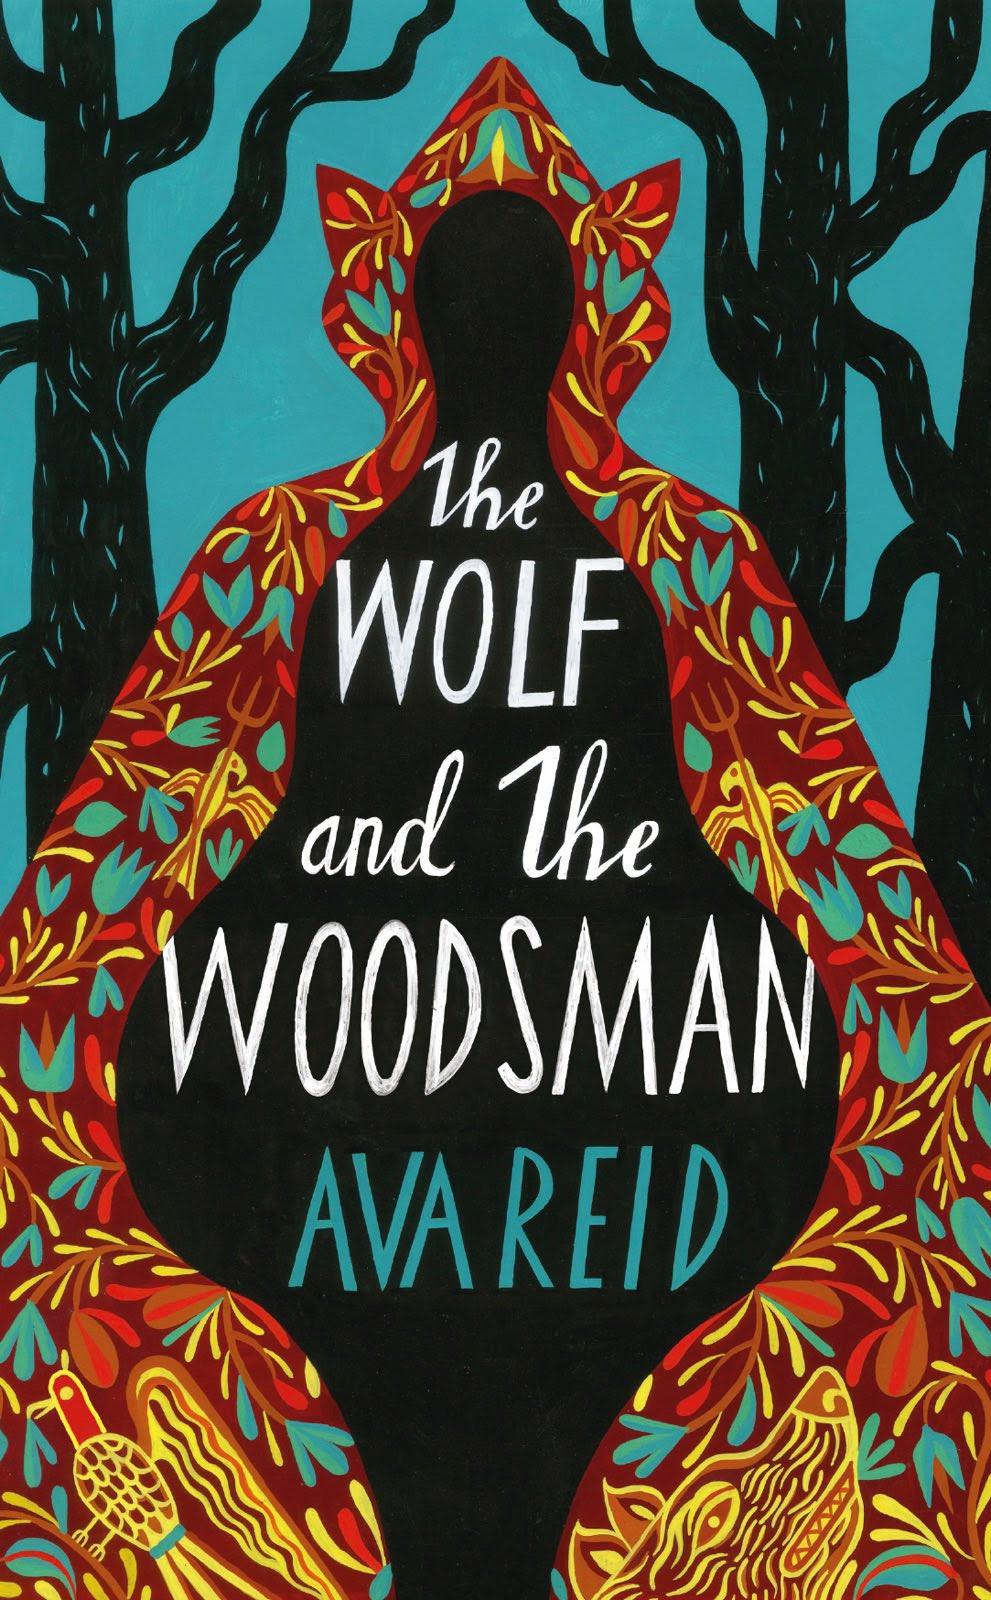 ✔️ Download The Wolf and the Woodsman - Ava Reid PDF ✔️ Free pdf download ✔️ Ebook ✔️ Epub